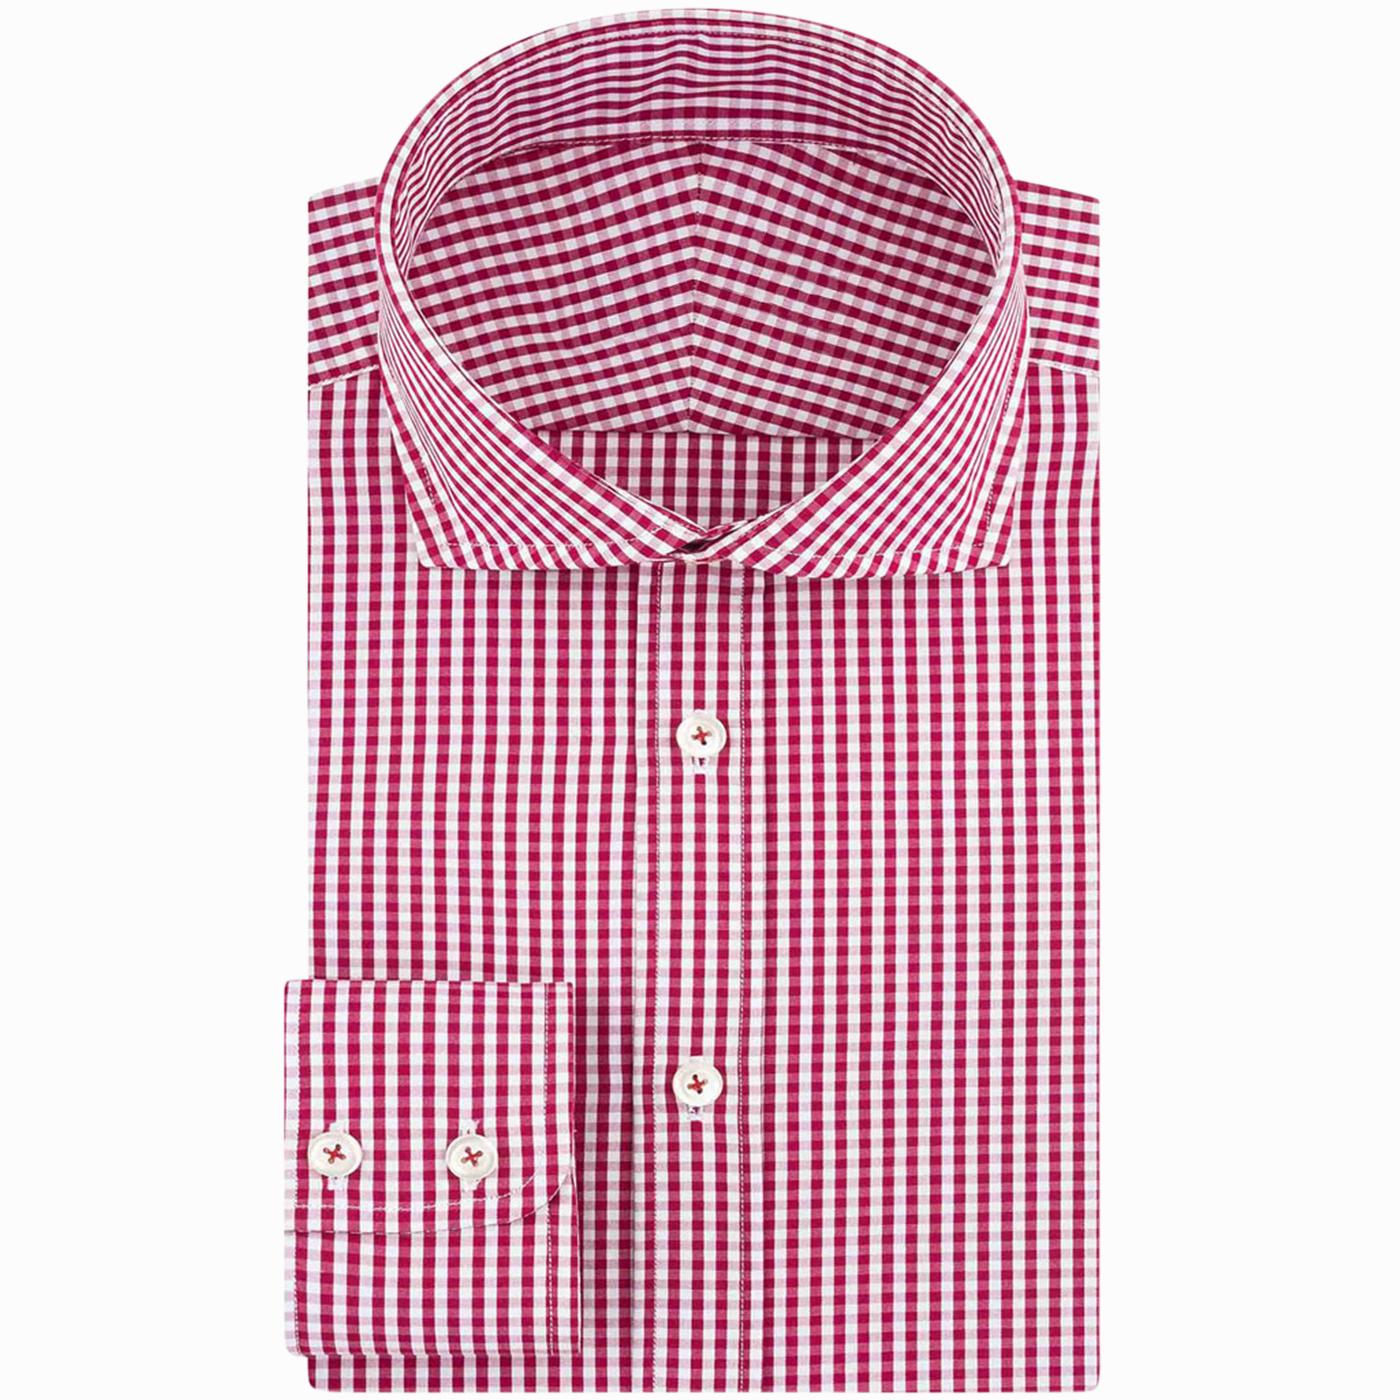 Shirt_5_Classic-gingham_burgandy.jpg